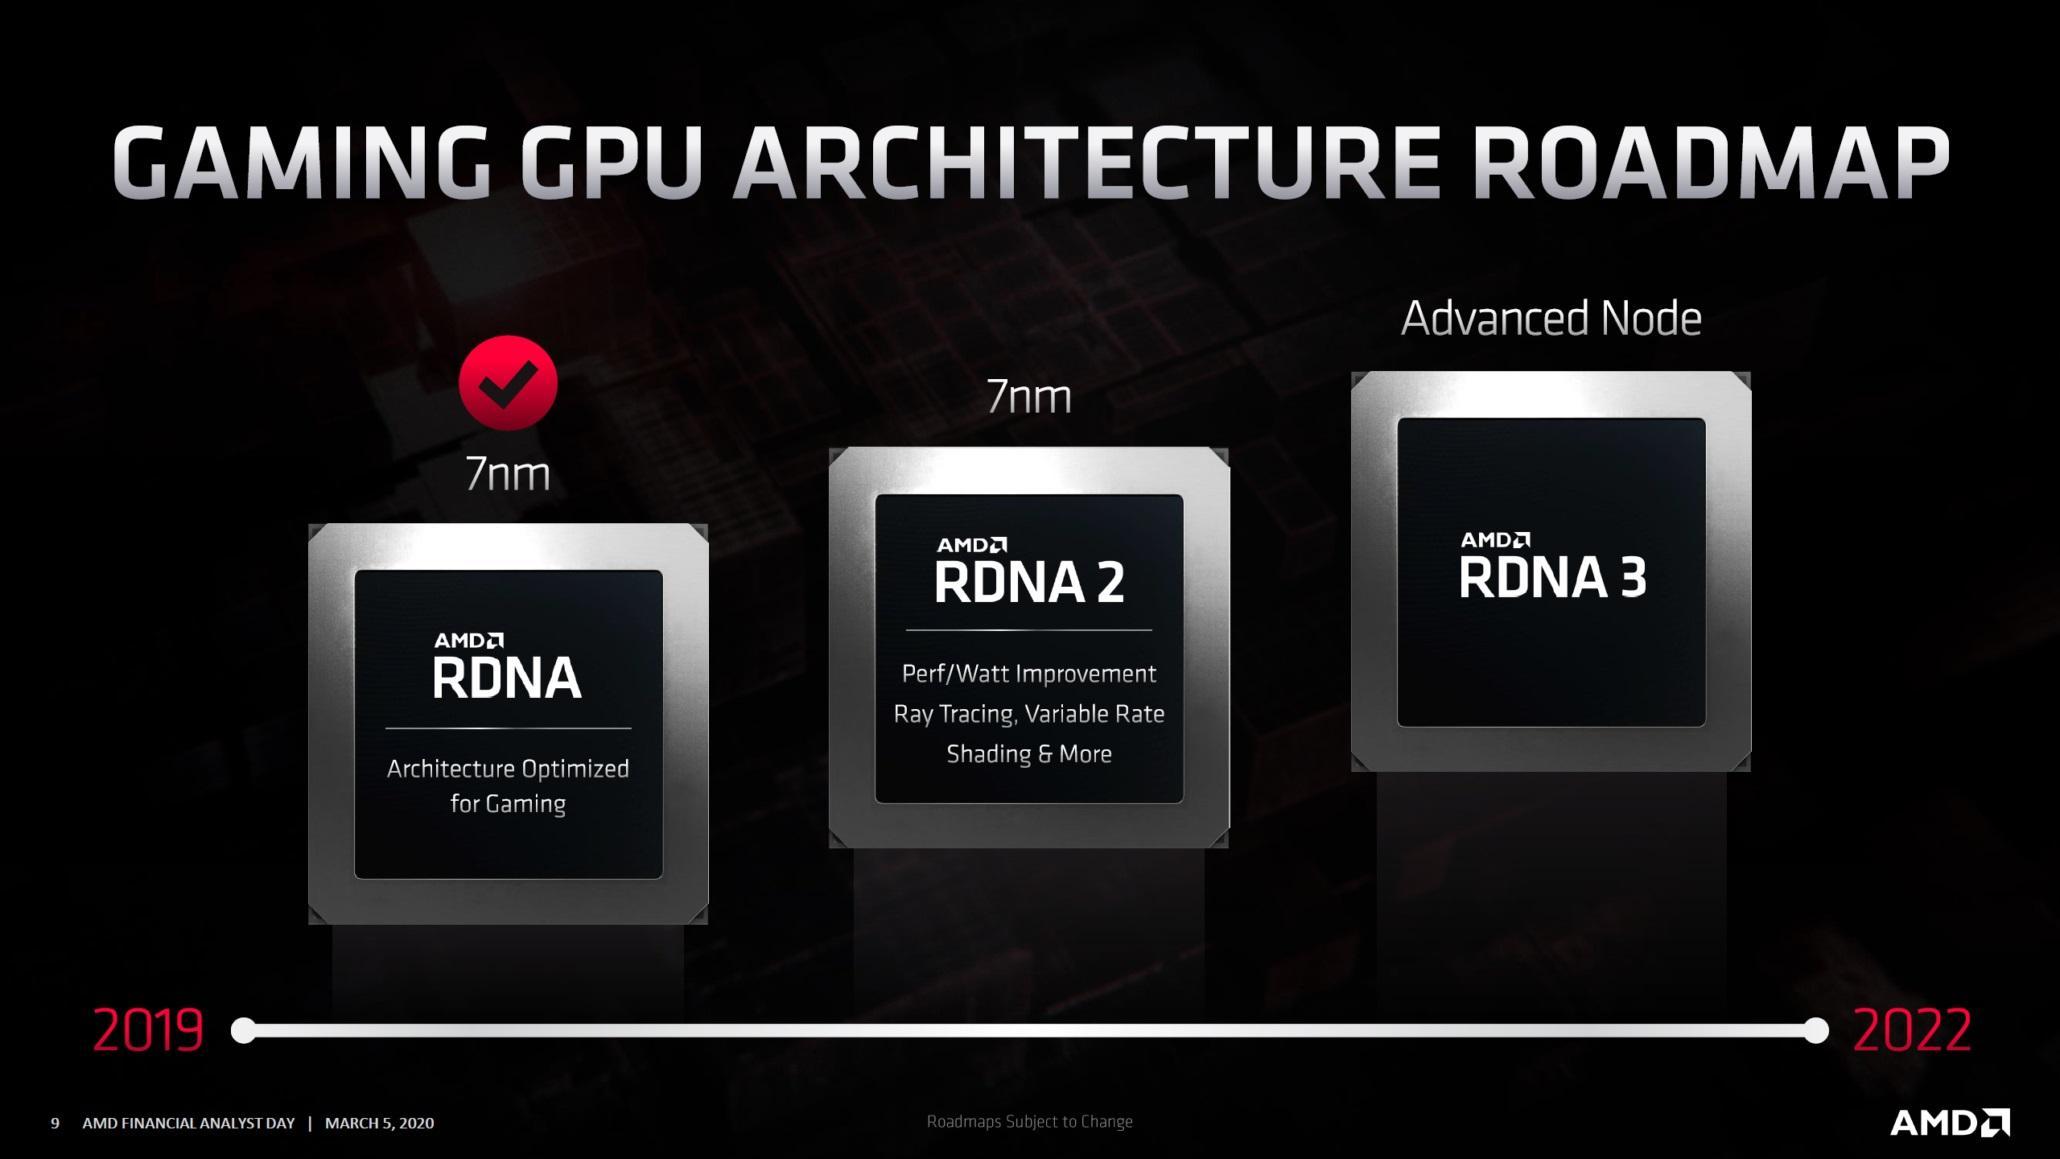 AMD Radeon Roadmap rdna radna 2 rdna 3